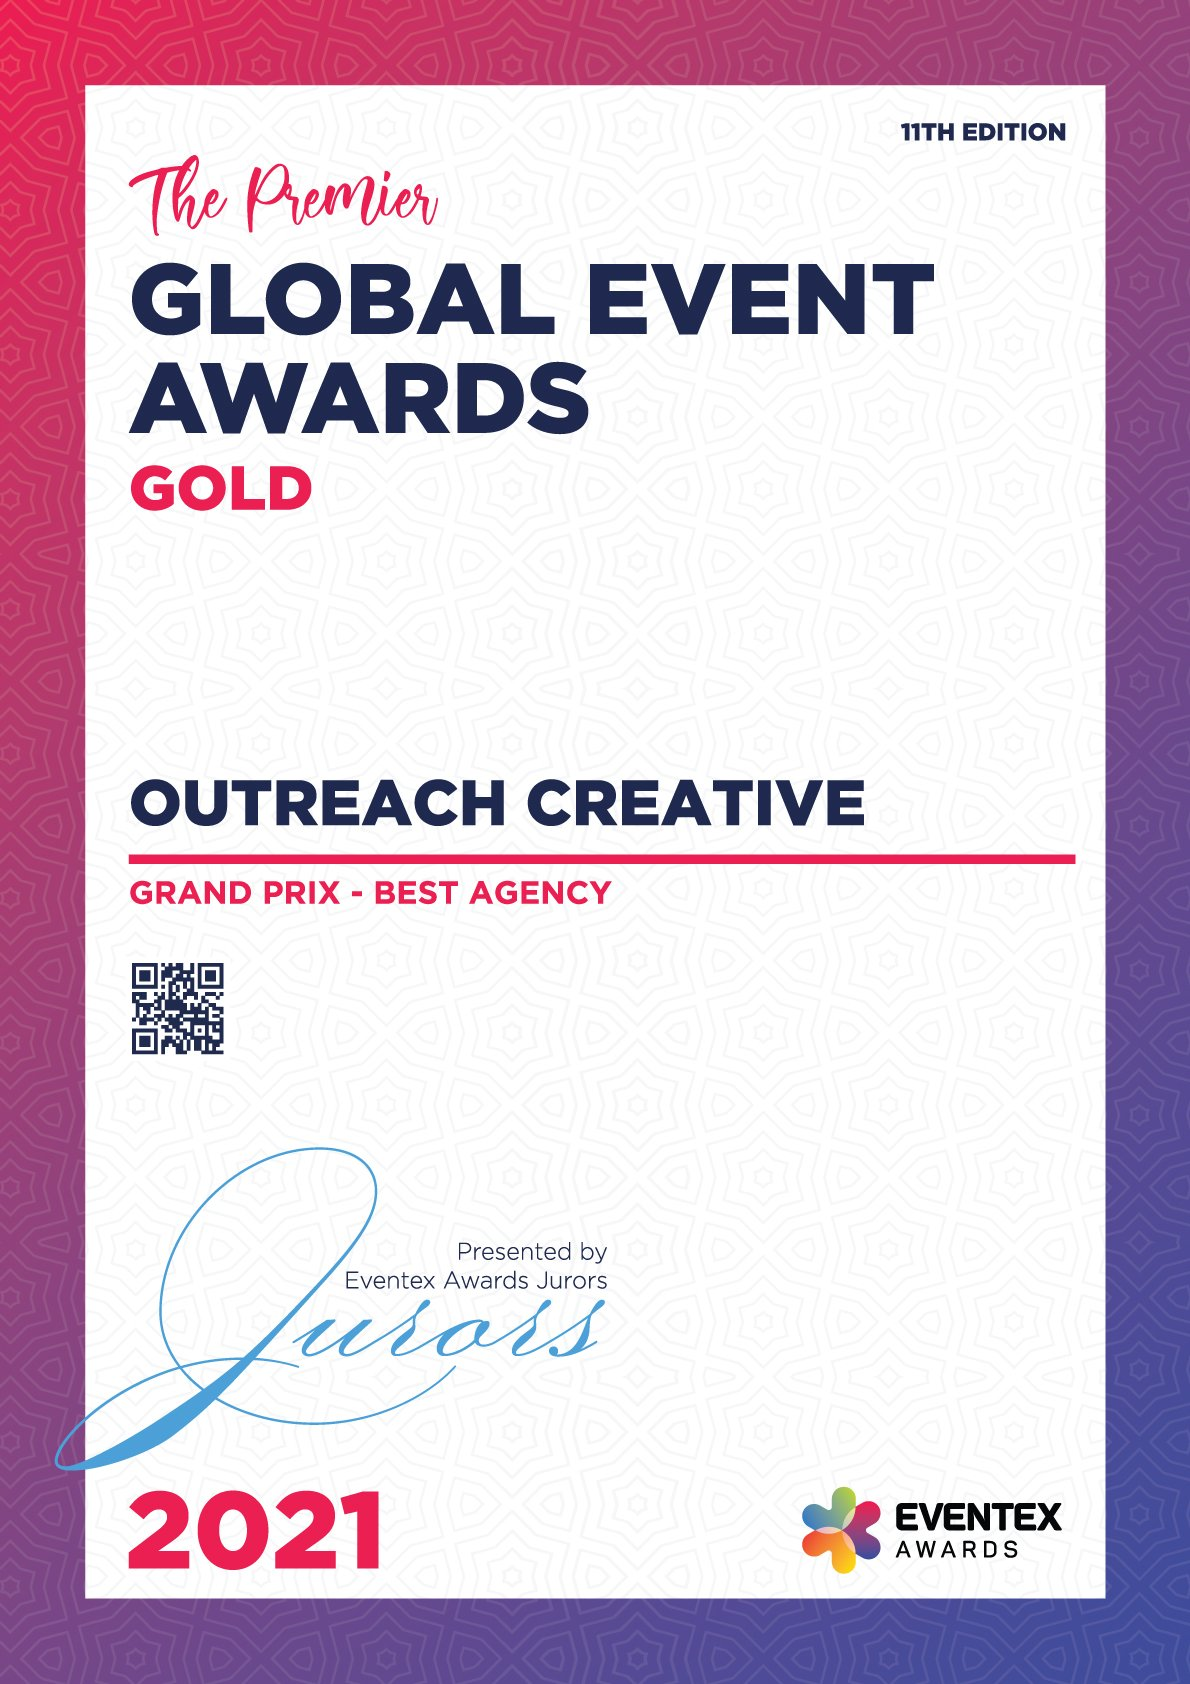 OUTREACH-CREATIVE-Grand-Prix-Best-Agency-Gold-Eventex-2021